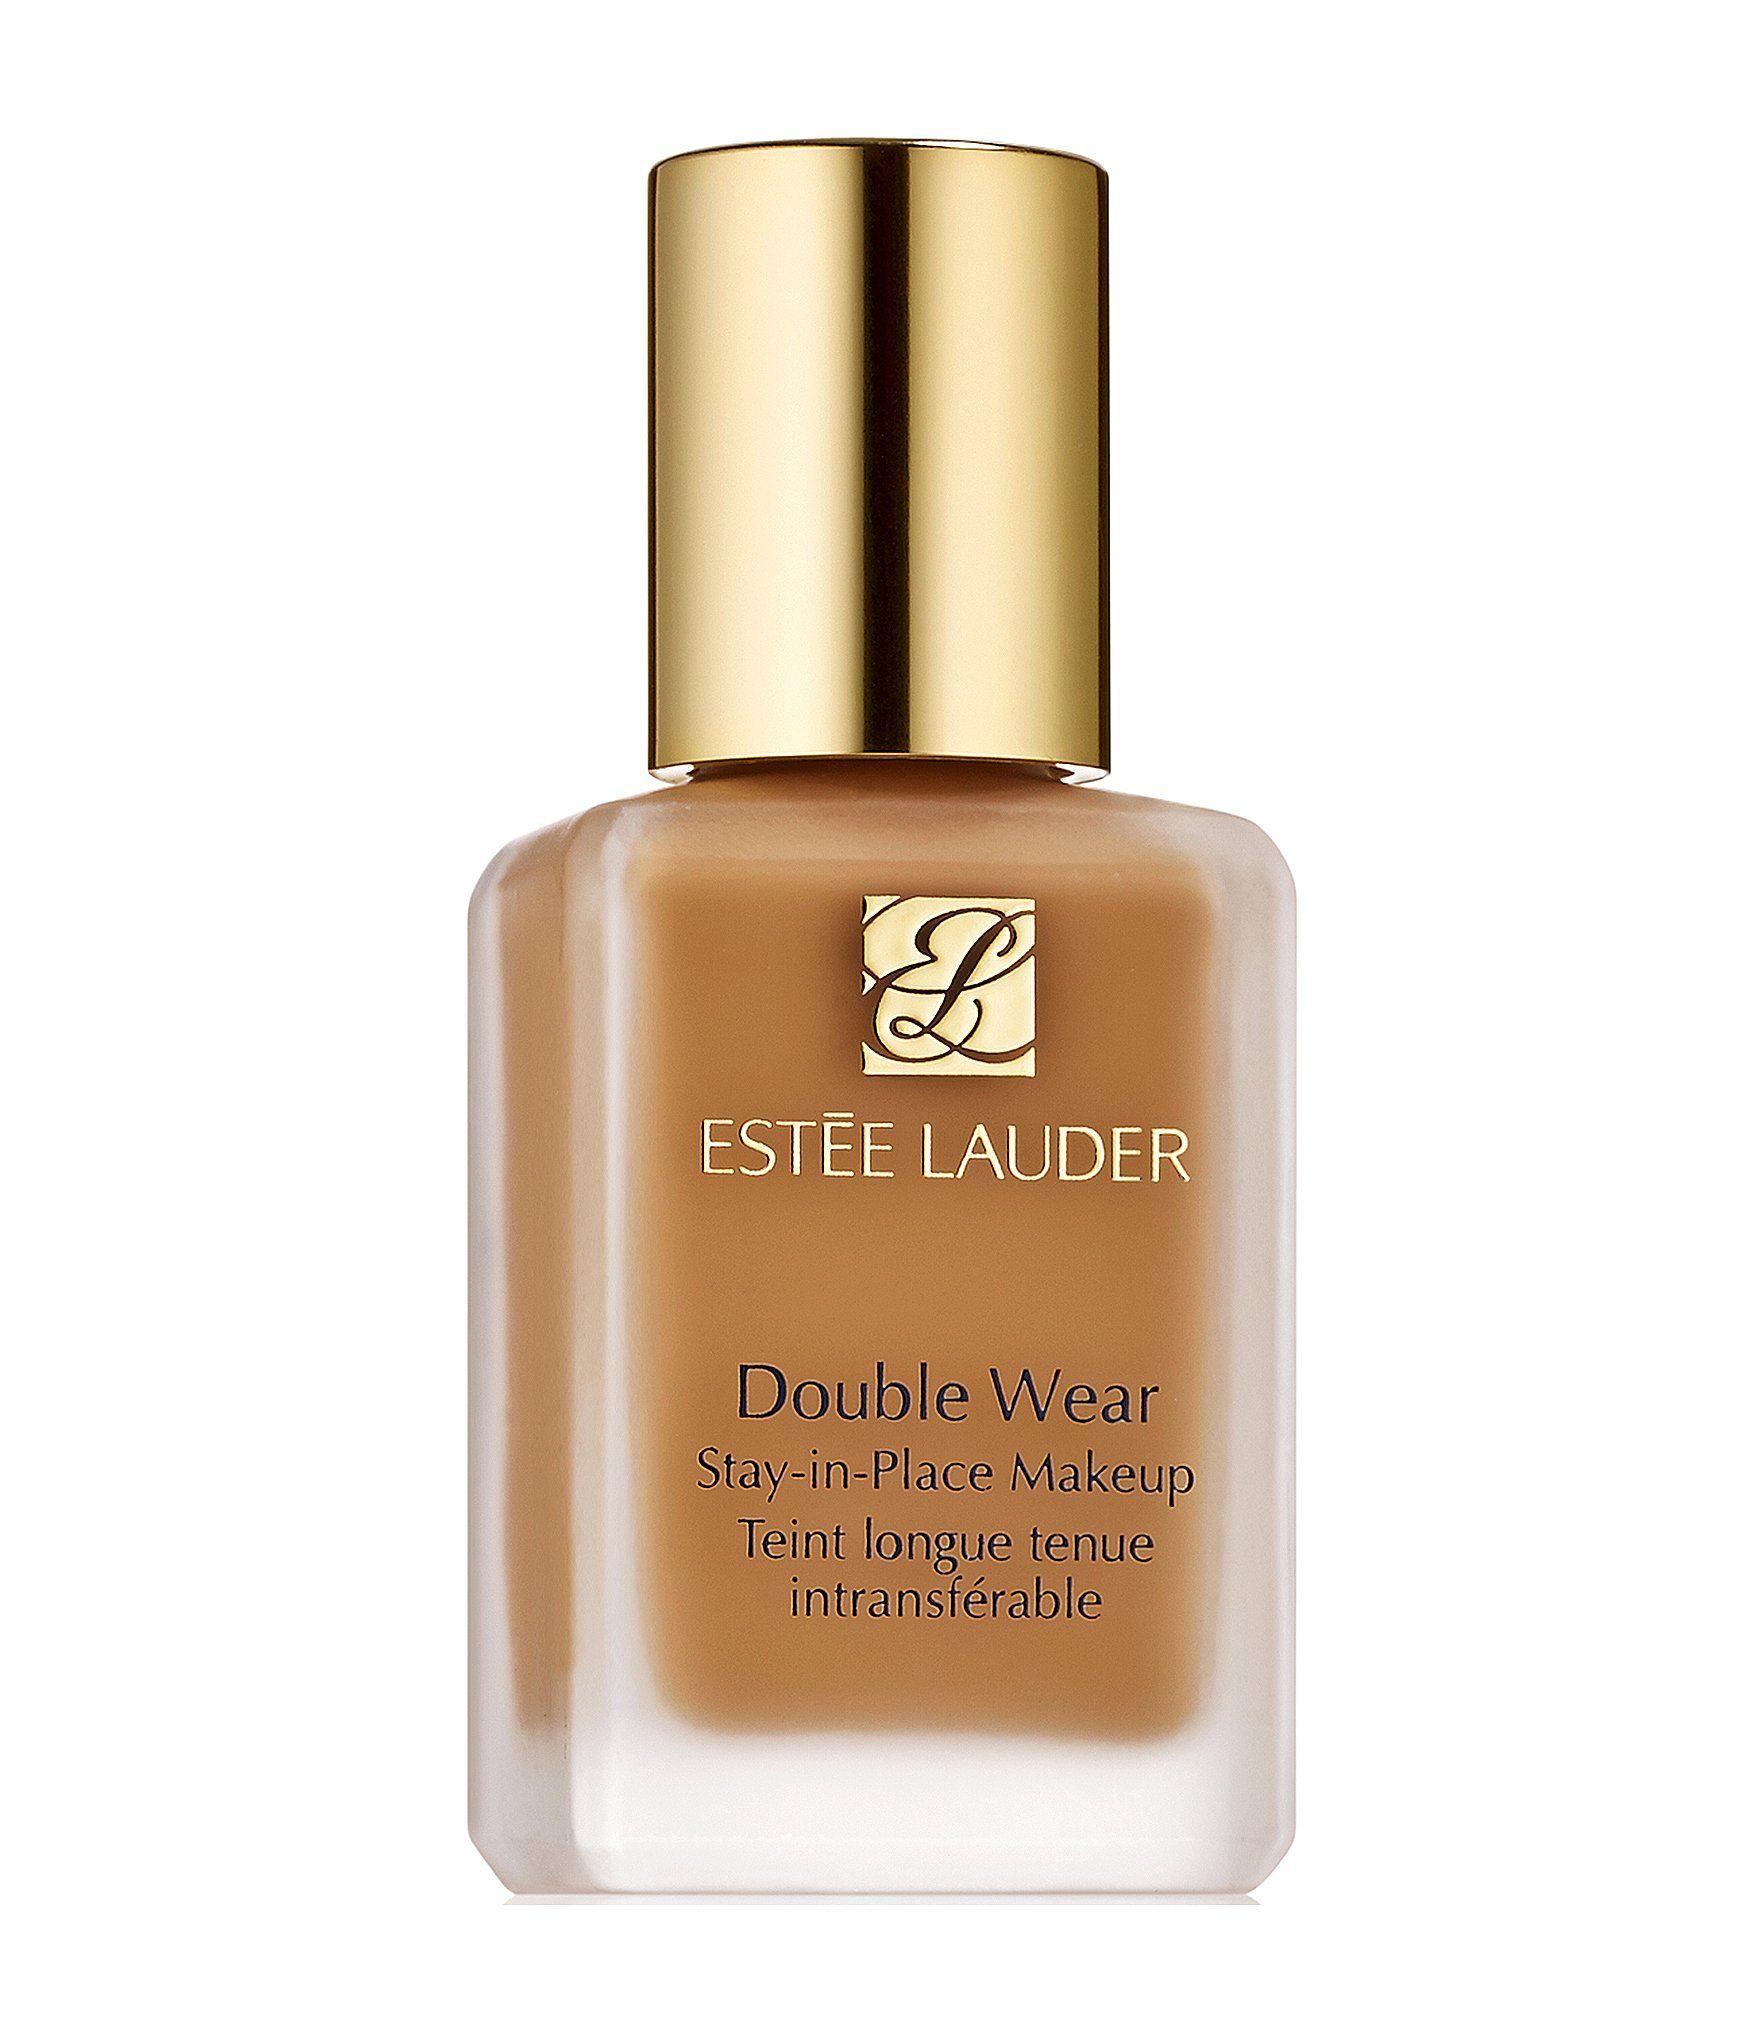 Estee Lauder Double Wear StayinPlace Makeup in 2020